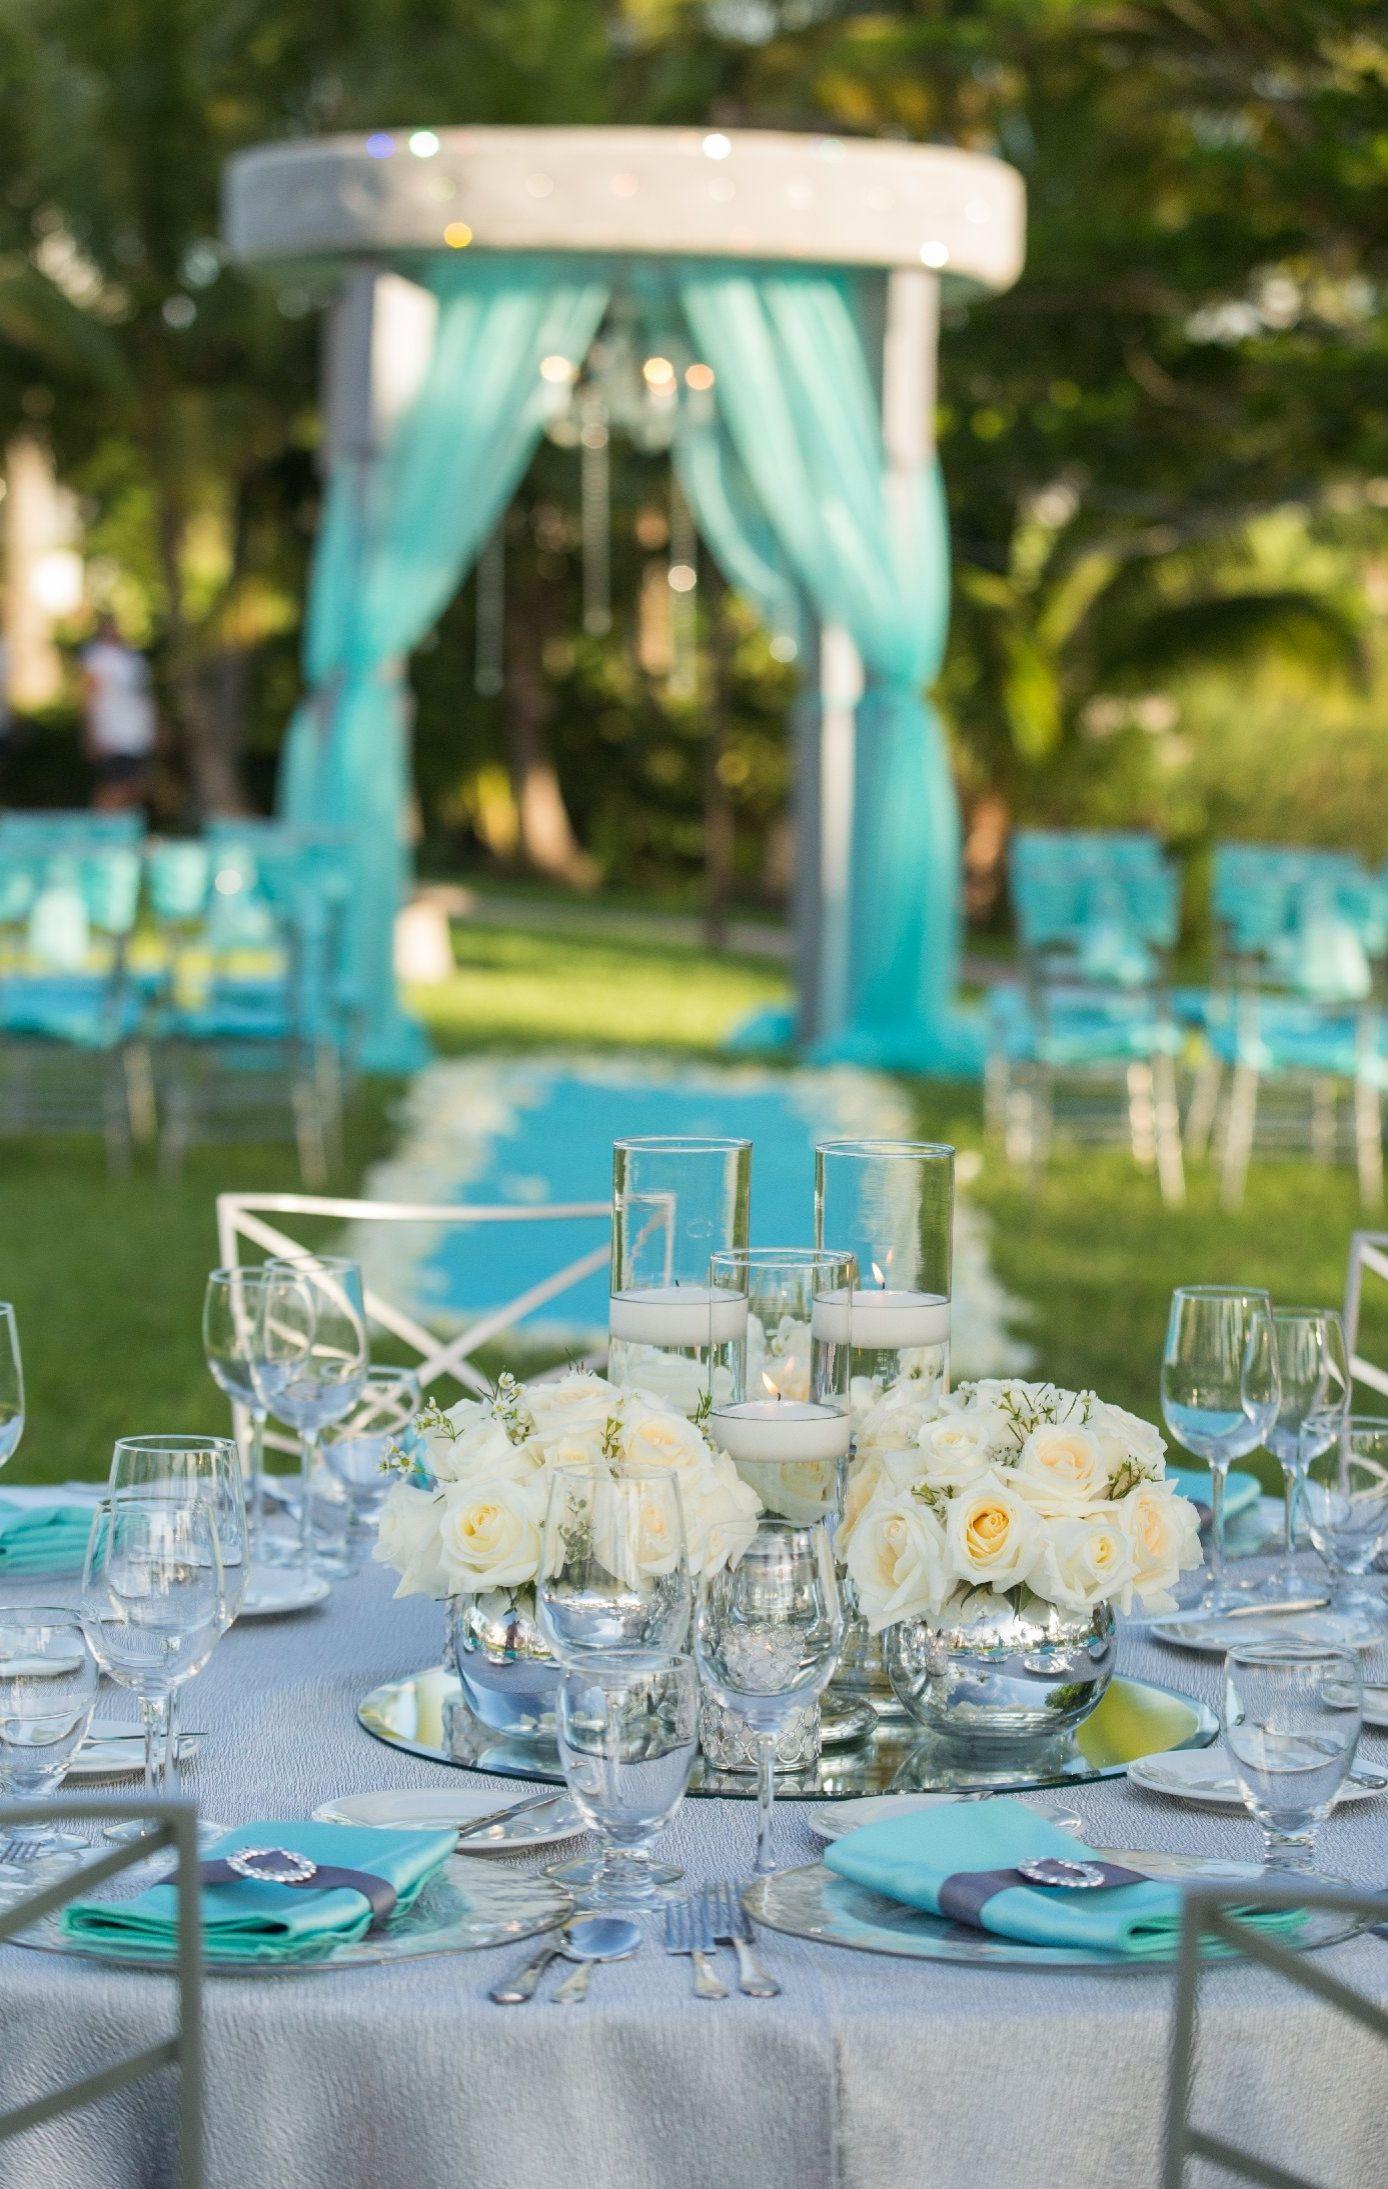 Grand wedding table setting at Grand Hyatt Baha Mar. & Grand wedding table setting at Grand Hyatt Baha Mar. | Honeymoon ...